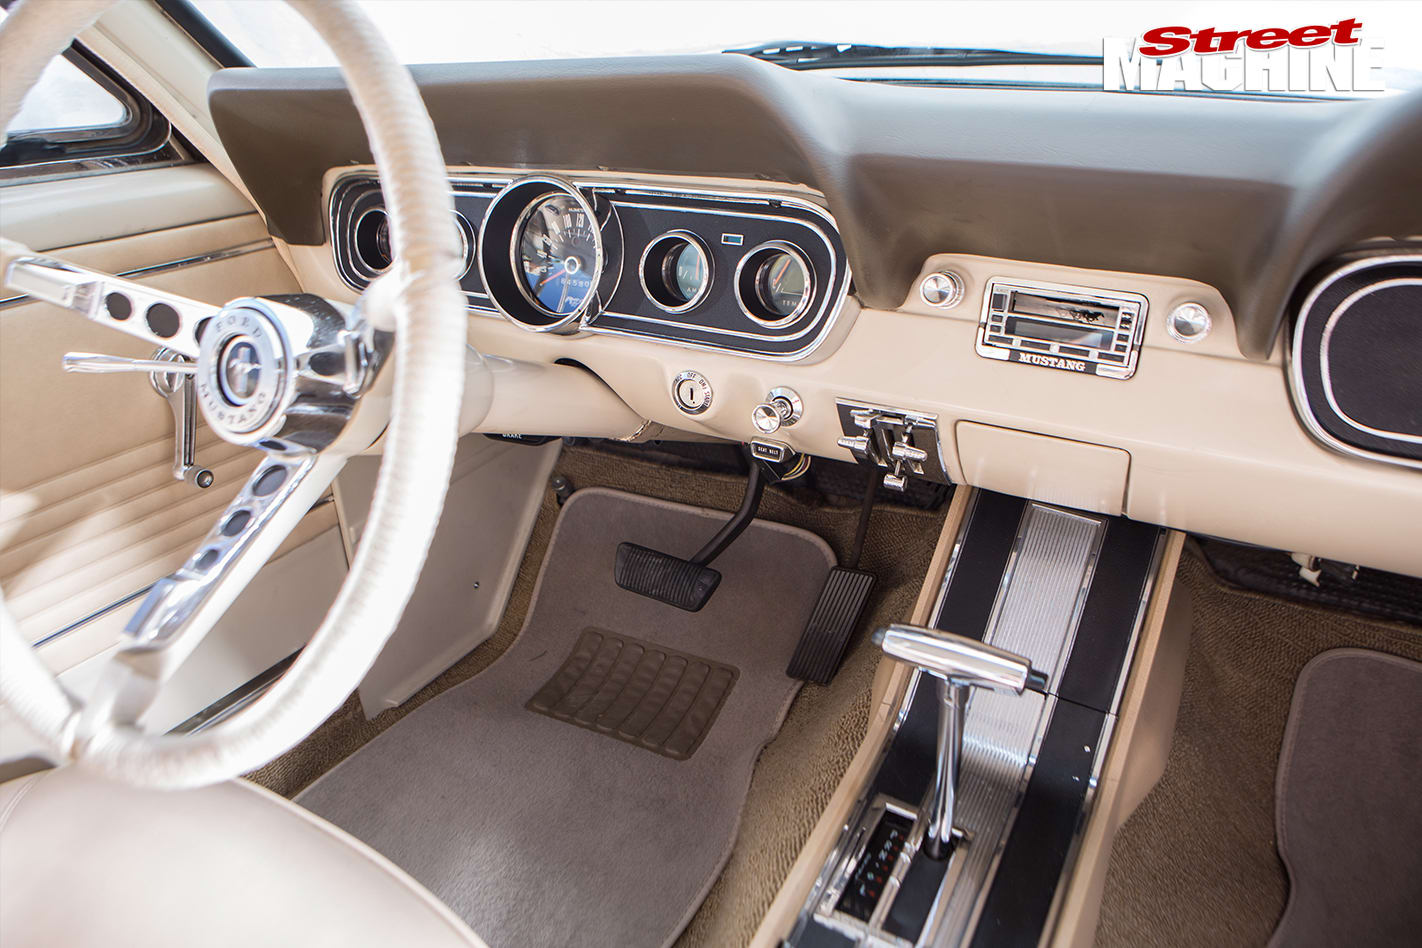 Nicole -Bridge -1966-Mustang -interior -front